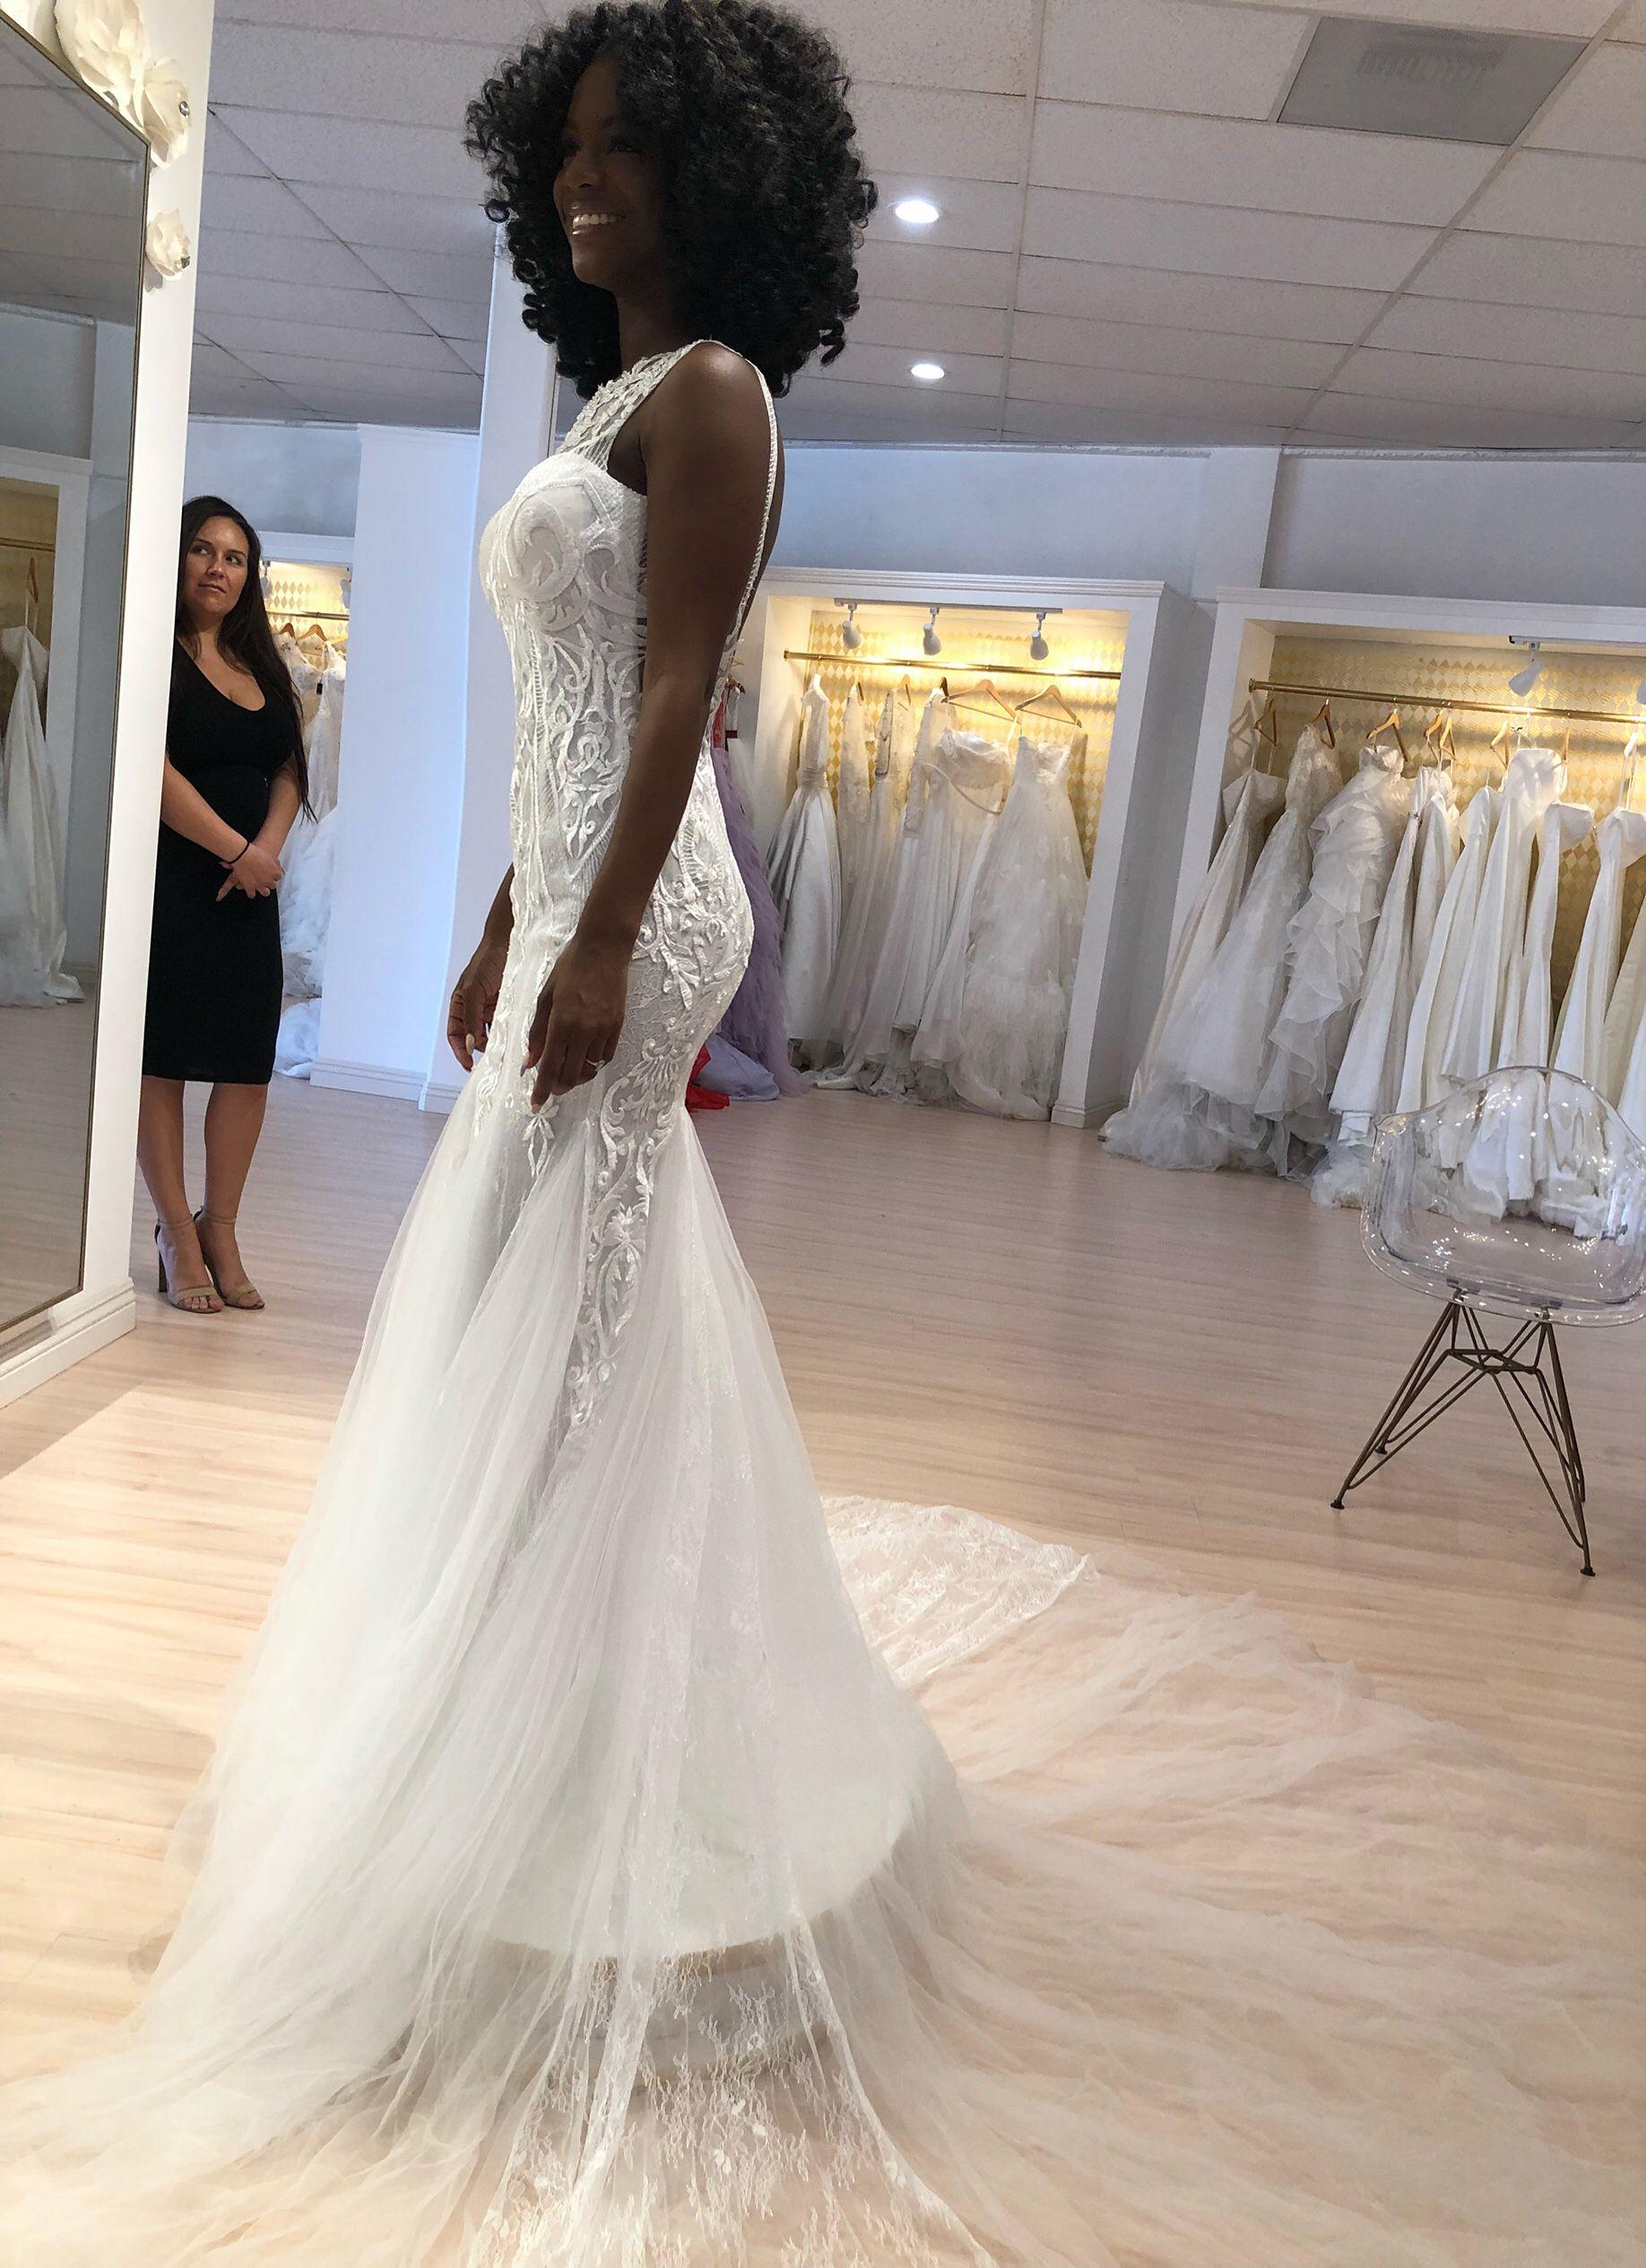 Custom Made Mermaid Style Wedding Dress Wedding Dresses Bridal Wedding Dresses Wedding Dresses Lace